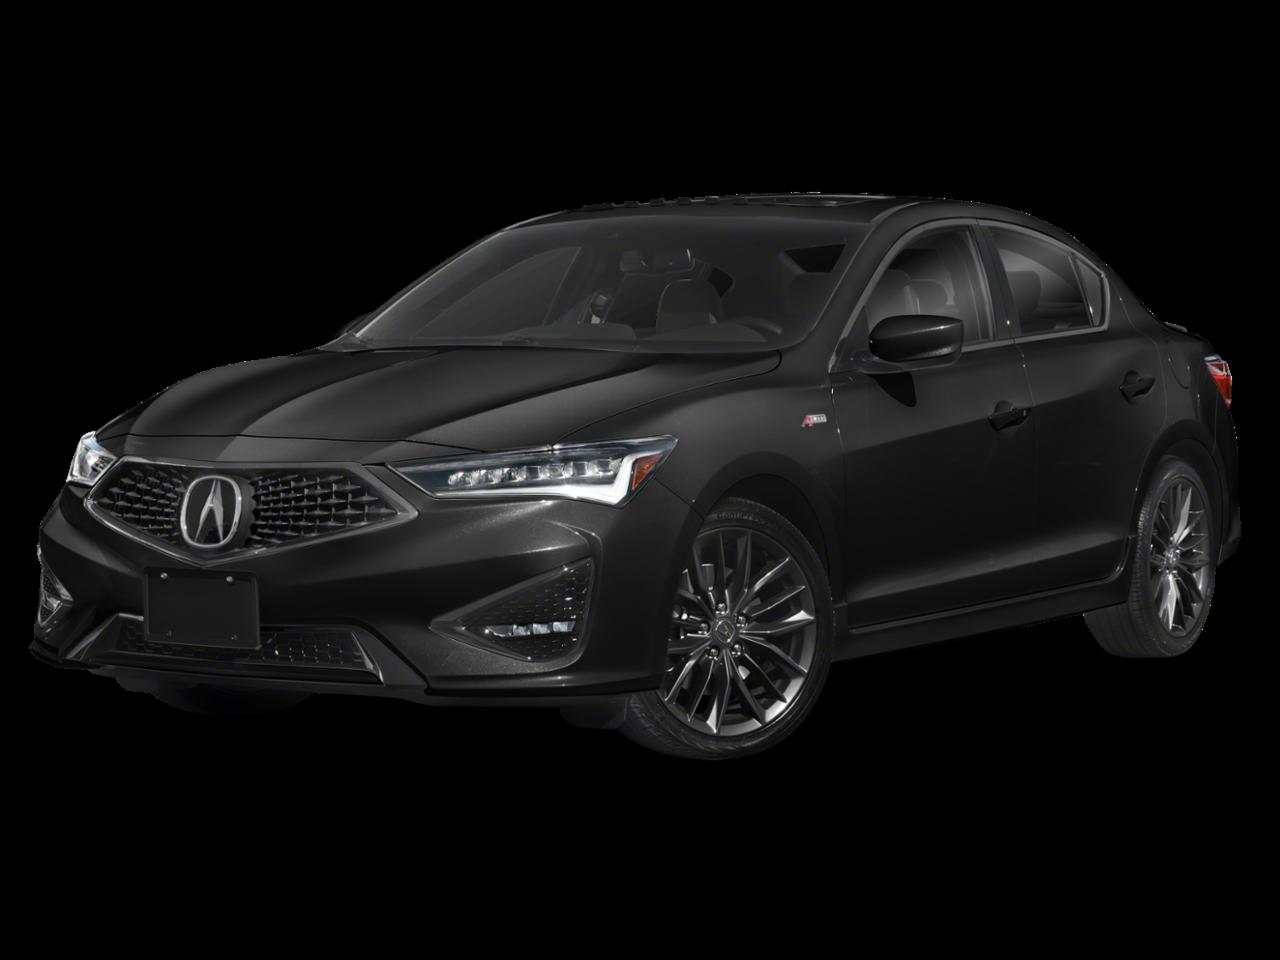 Acura 2021 ILX w/Premium/A-Spec Package